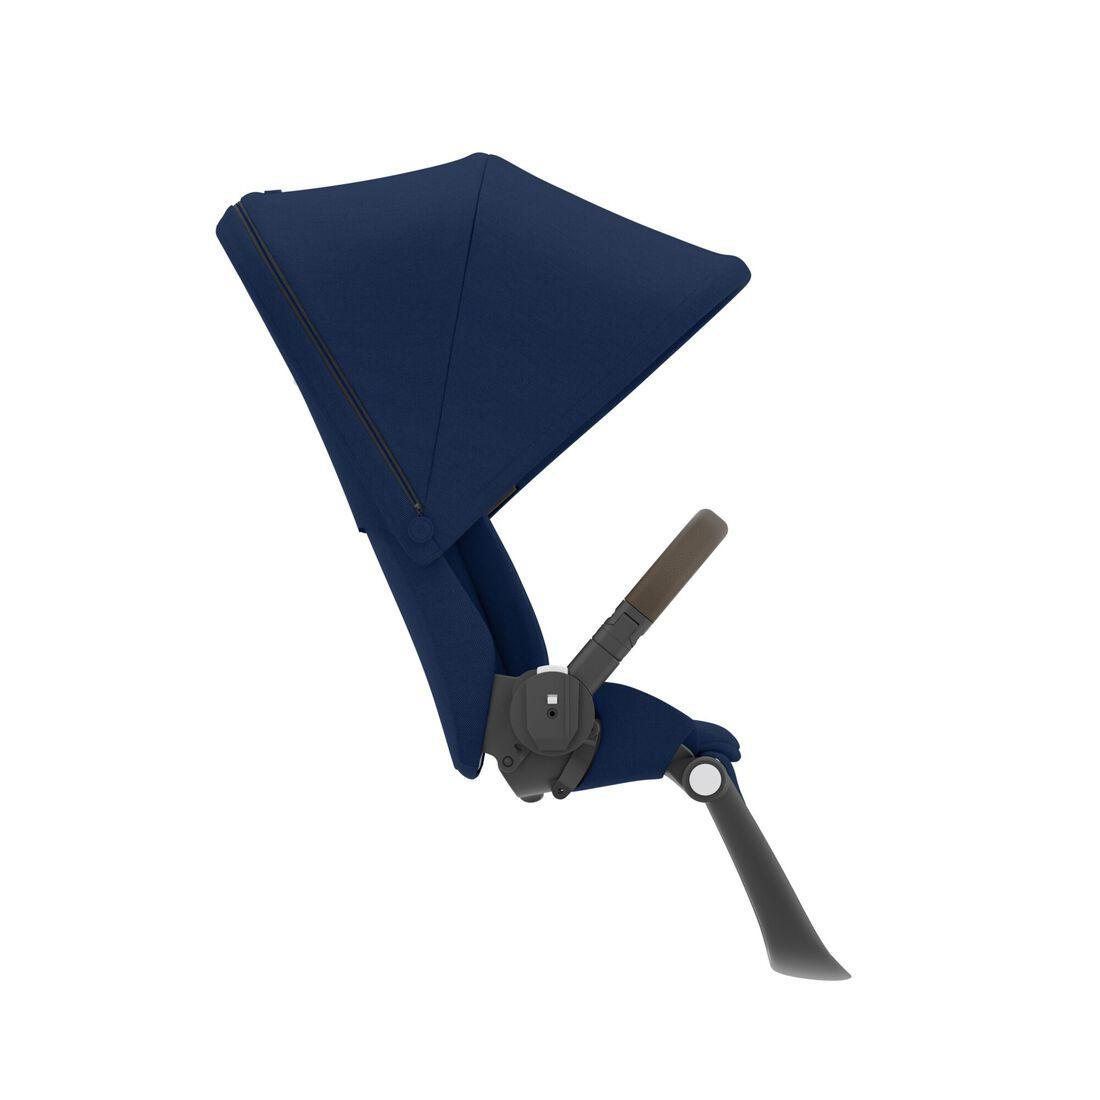 CYBEX Gazelle S Sitzeinheit - Navy Blue (Taupe Frame) in Navy Blue (Taupe Frame) large Bild 2